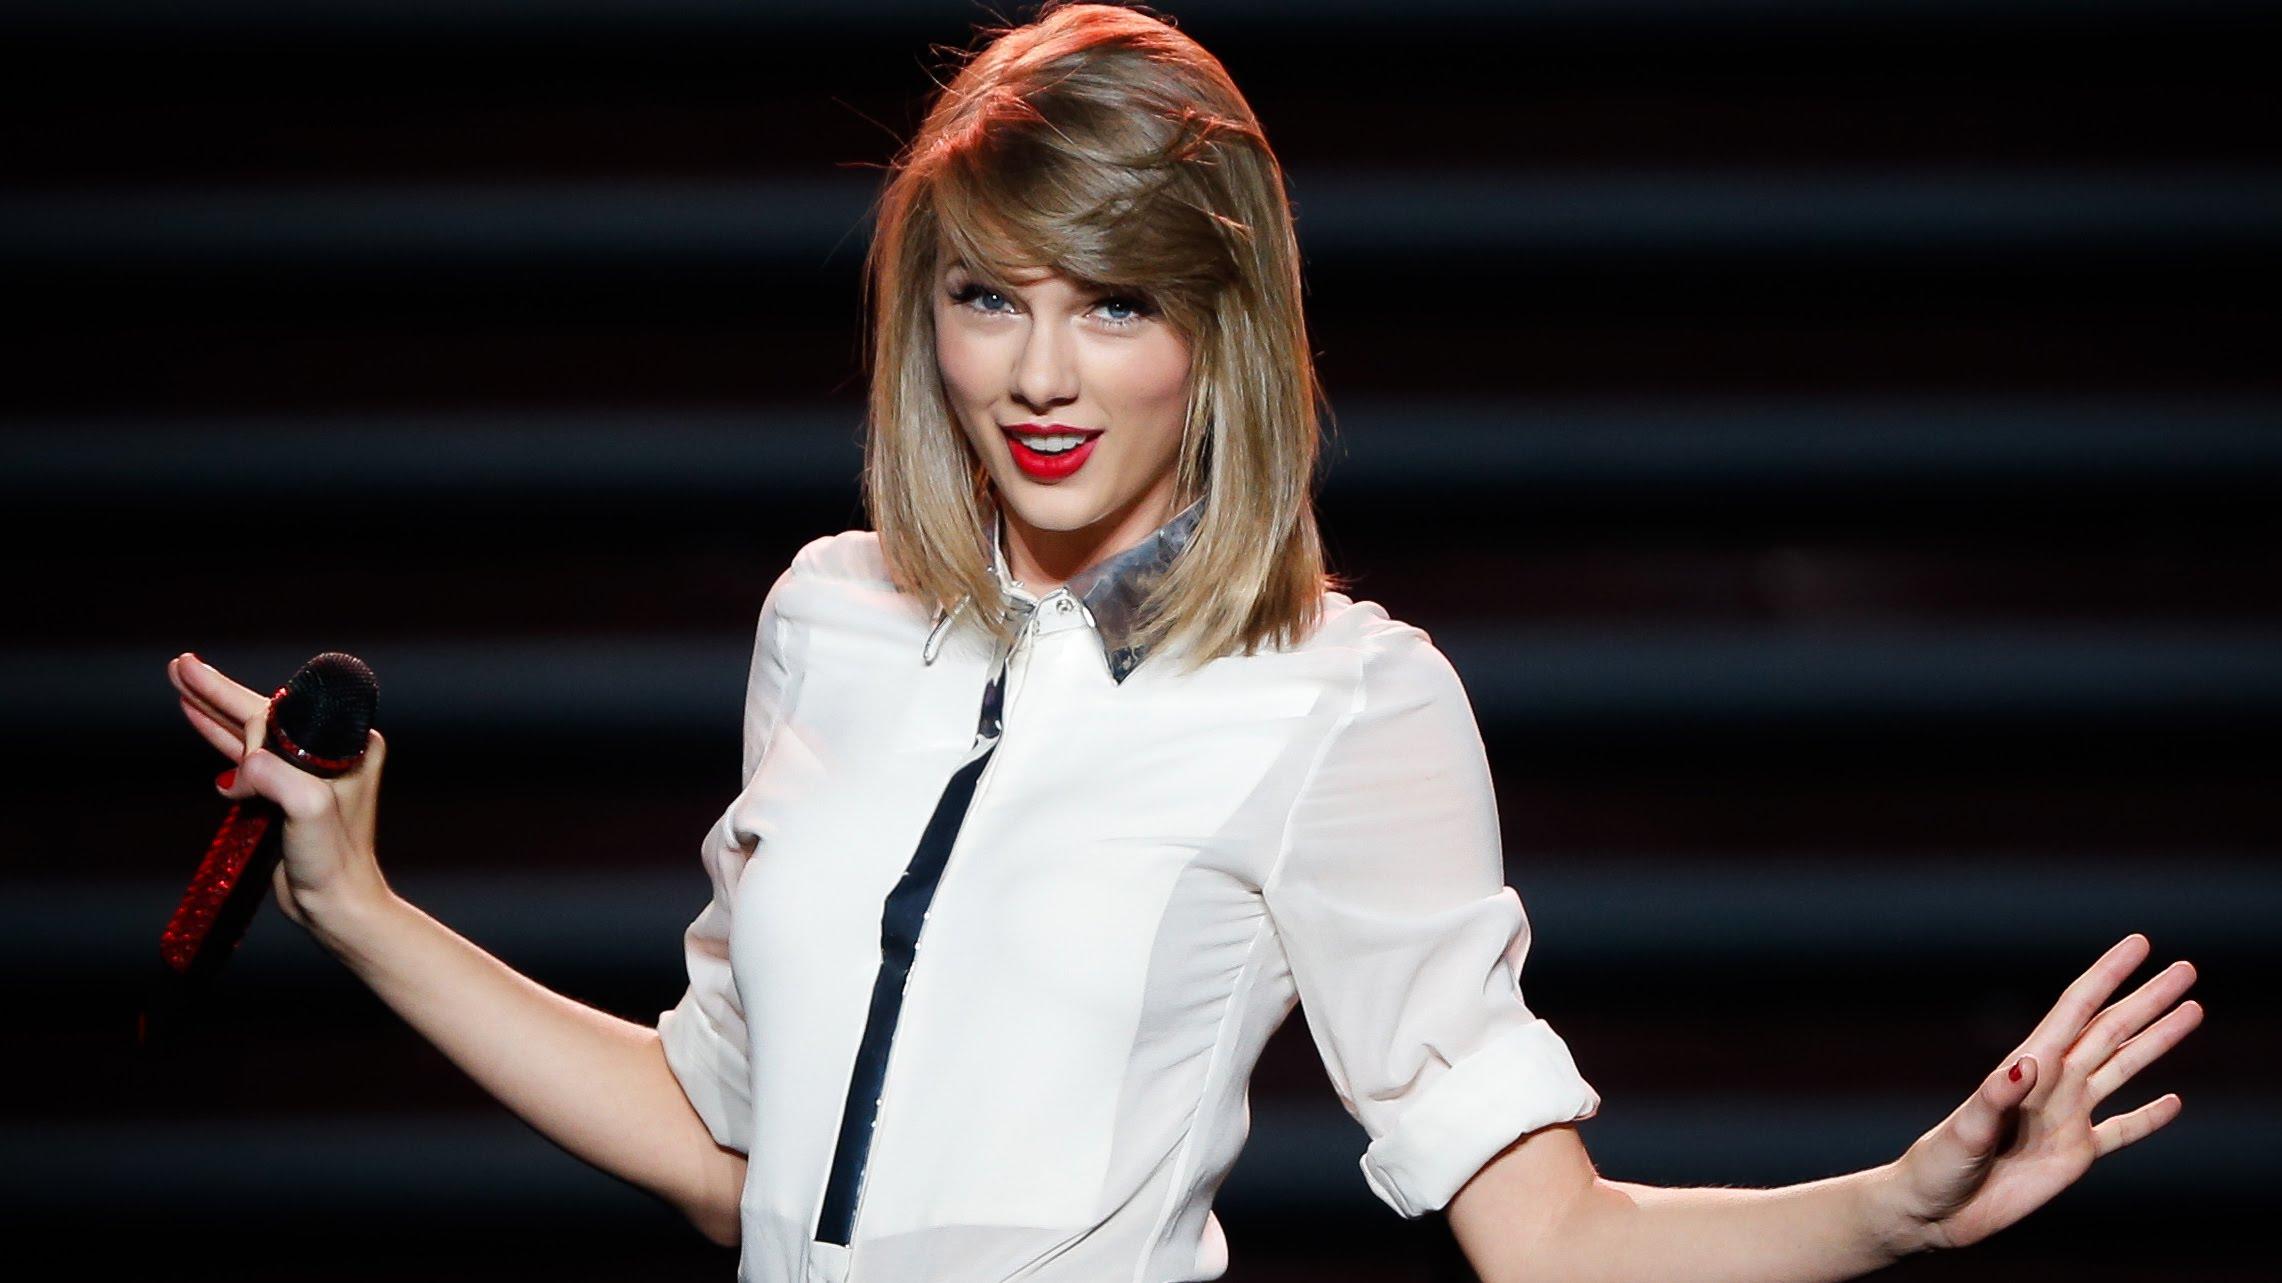 Taylor Swift dẫn đầu danh sách đề cử Video Music Awards 2015